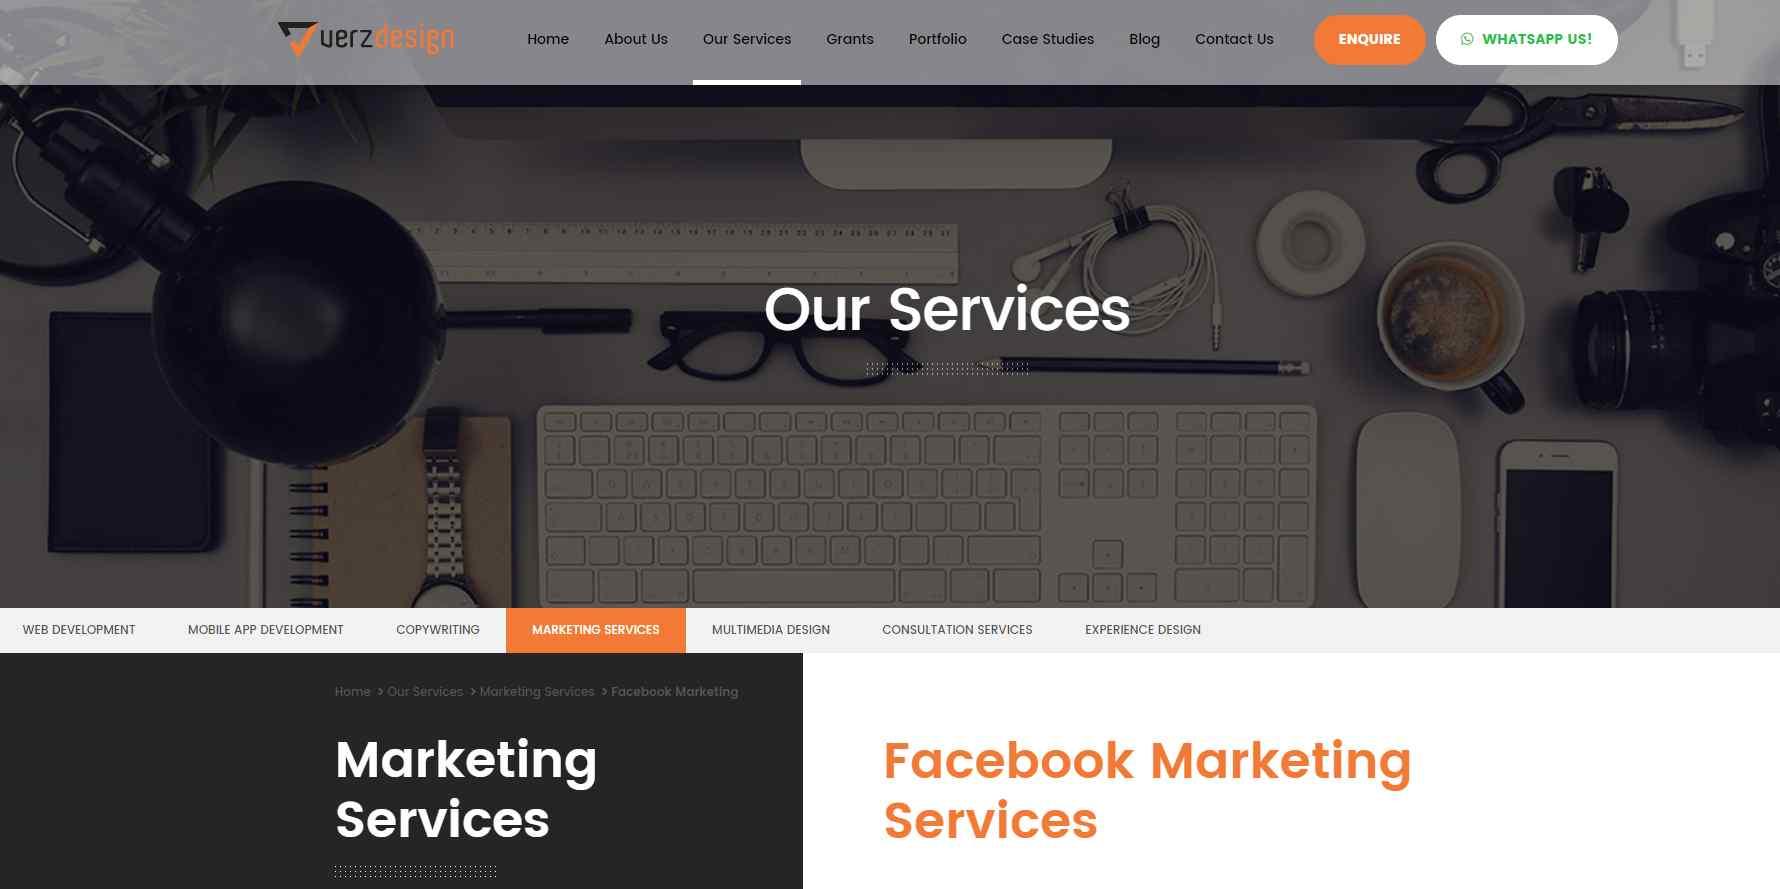 verz design 15 Top Facebook Marketing Agencies in Singapore